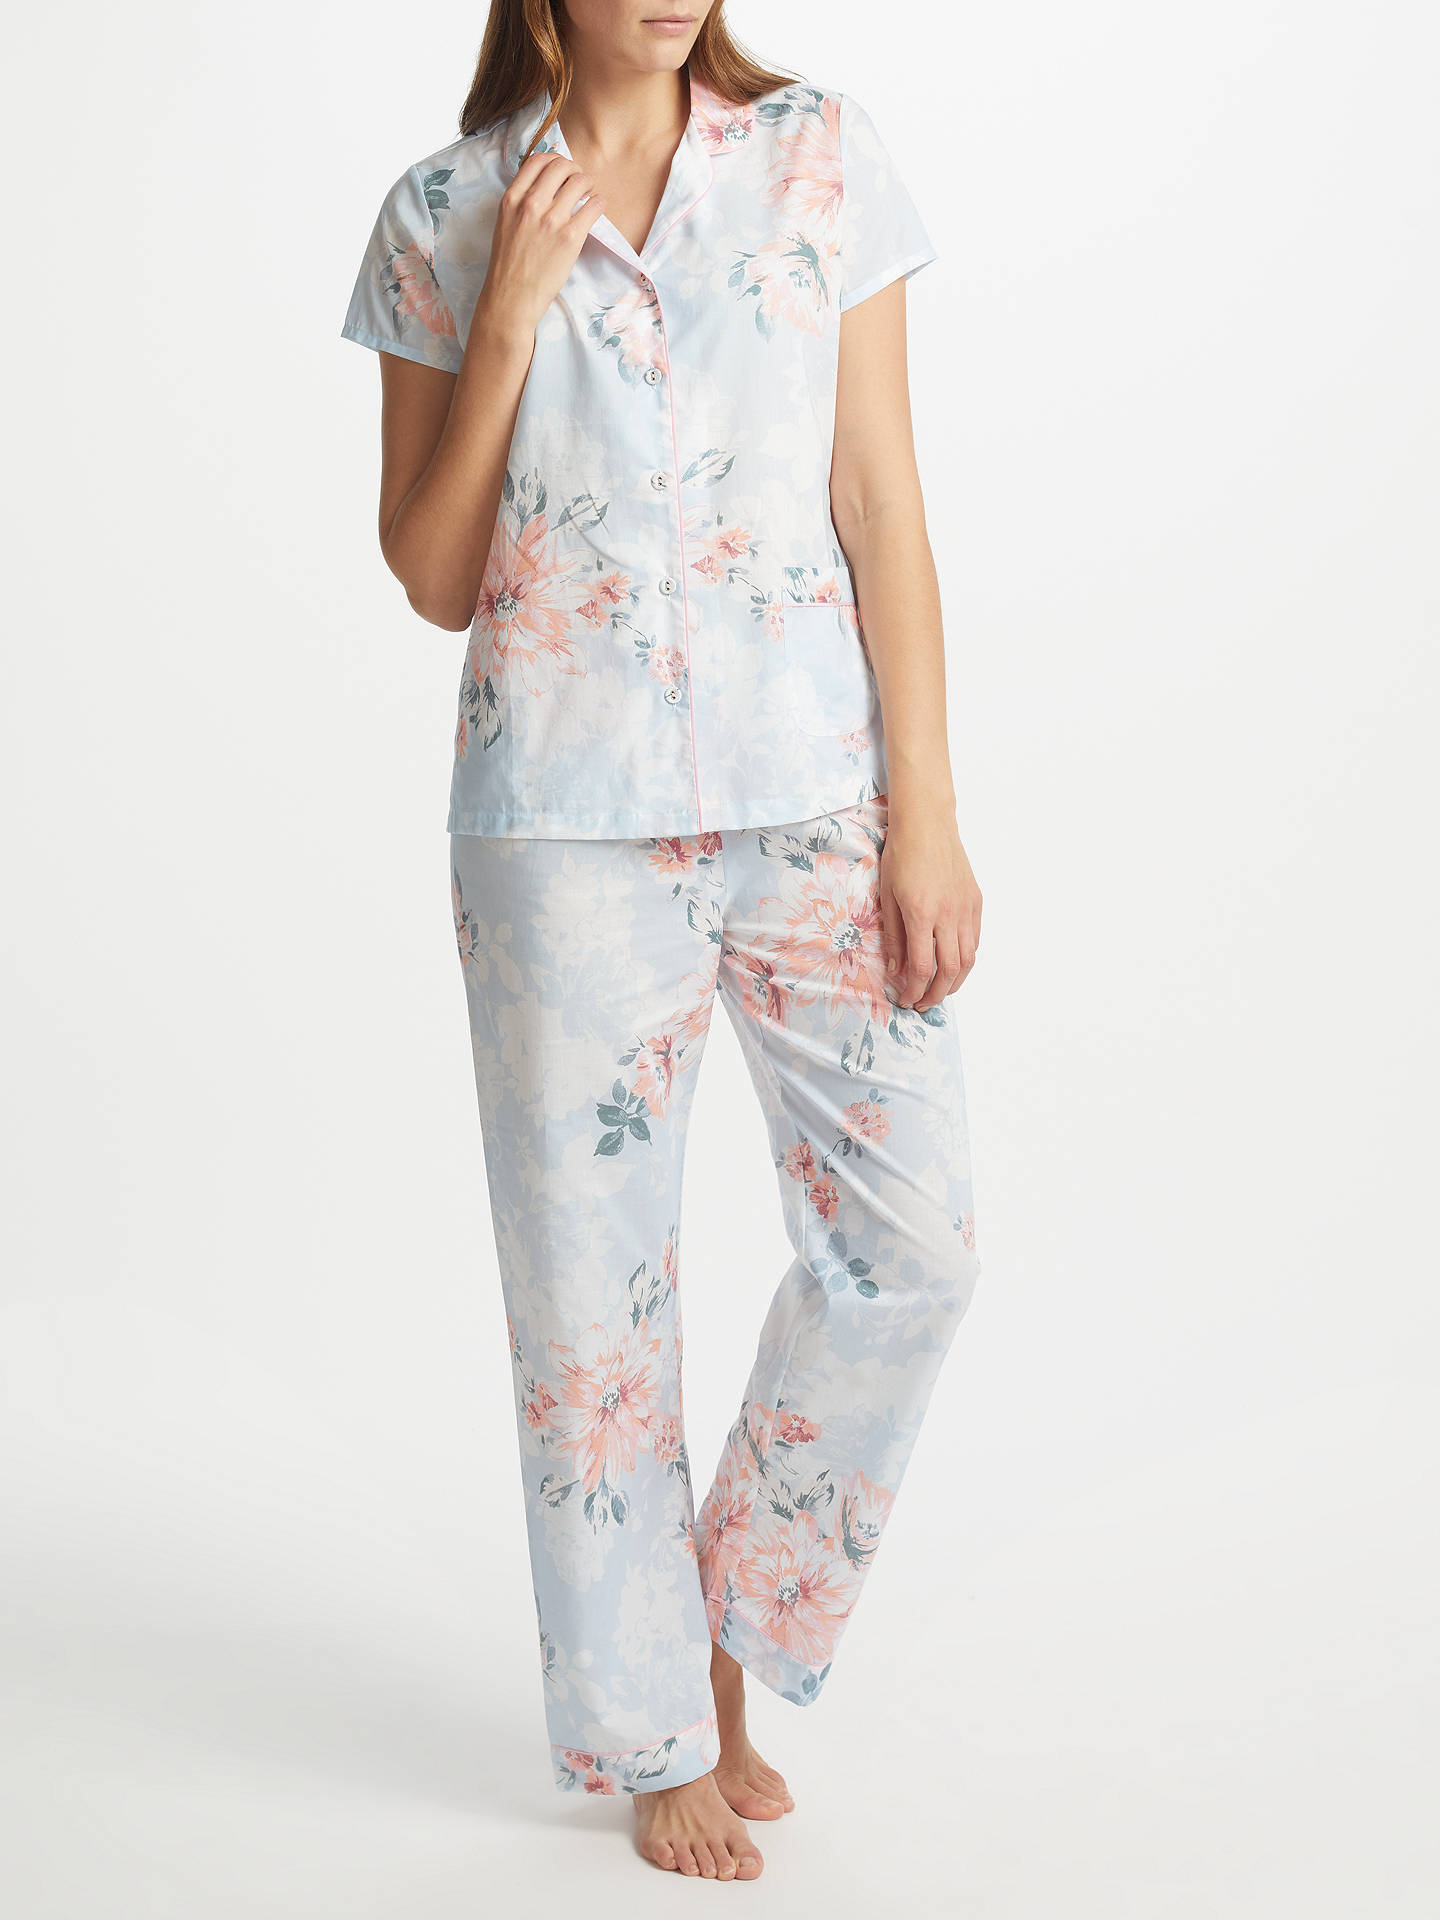 fdc5f891 Buy John Lewis Cassie Floral Print Short Sleeve Pyjama Set, Blue/Pink, 8 ...